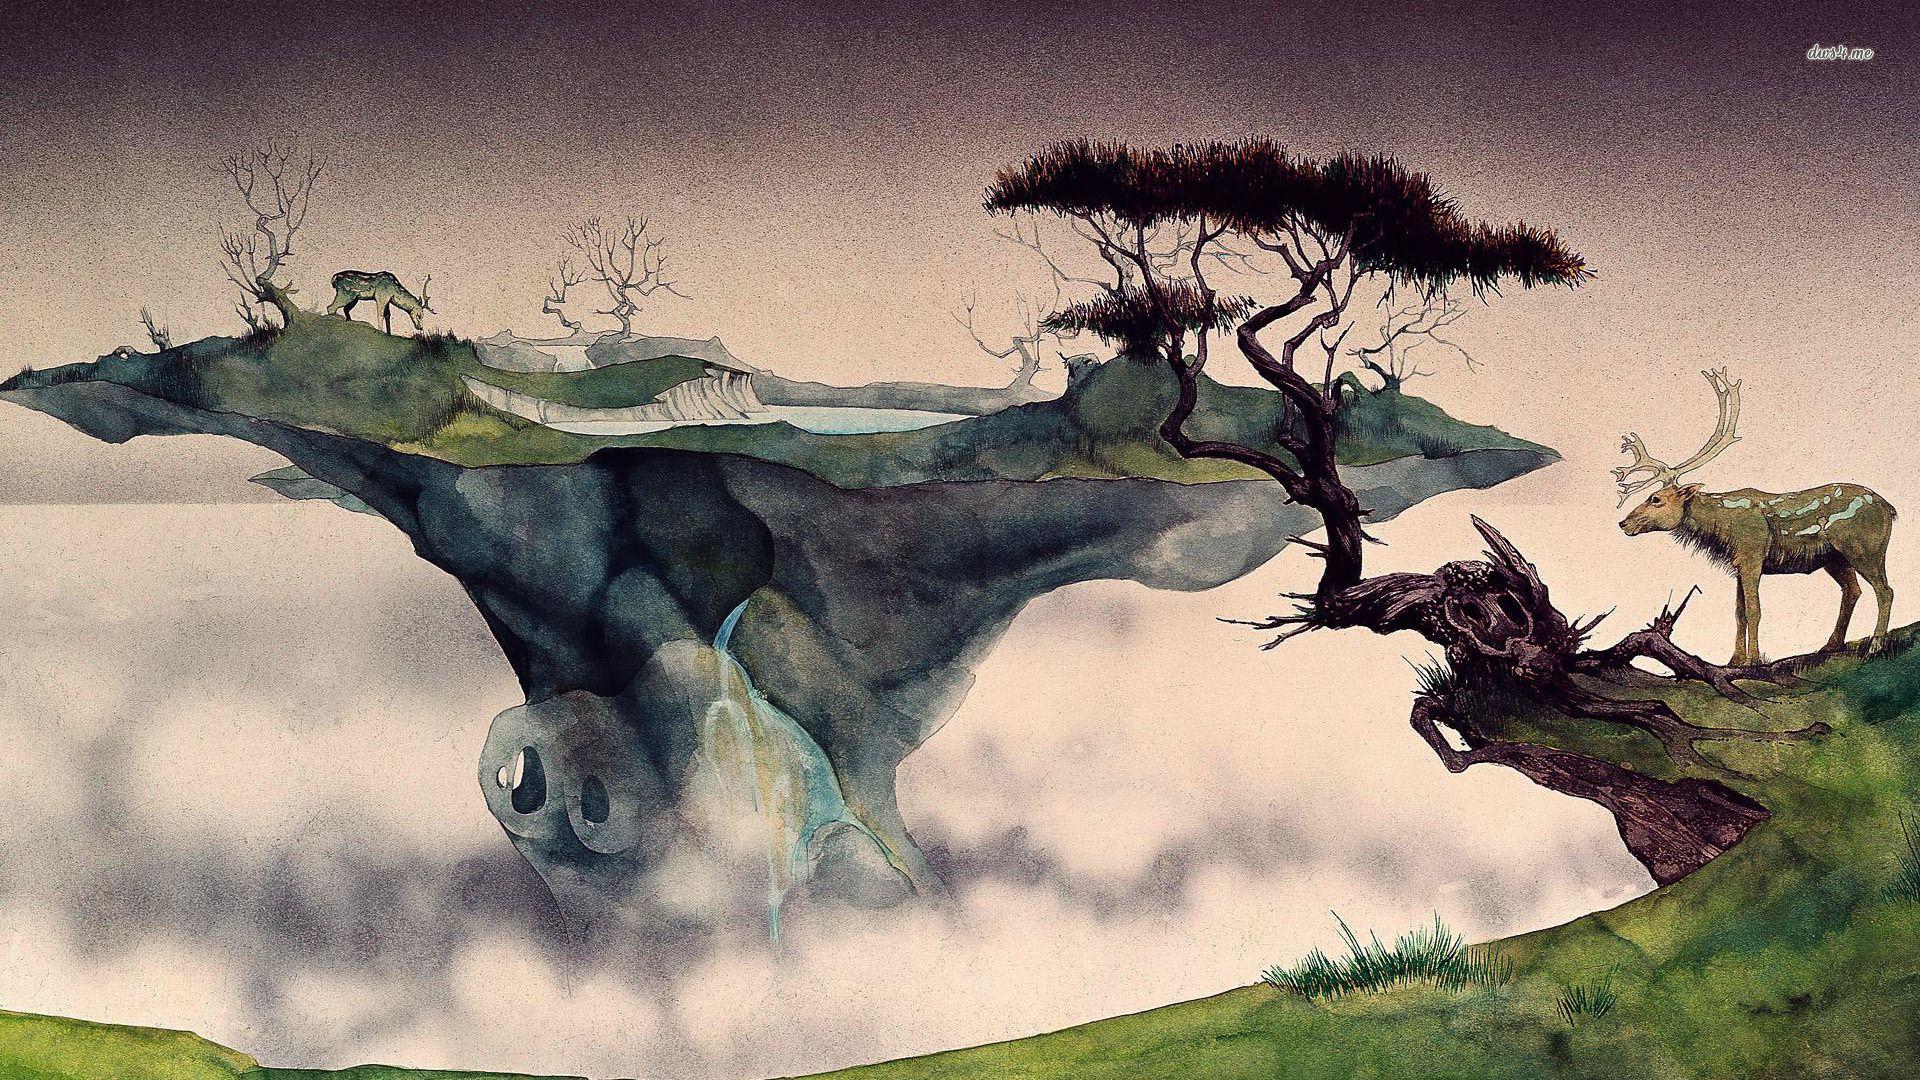 Floating island hd wallpaper roger dean dean album art